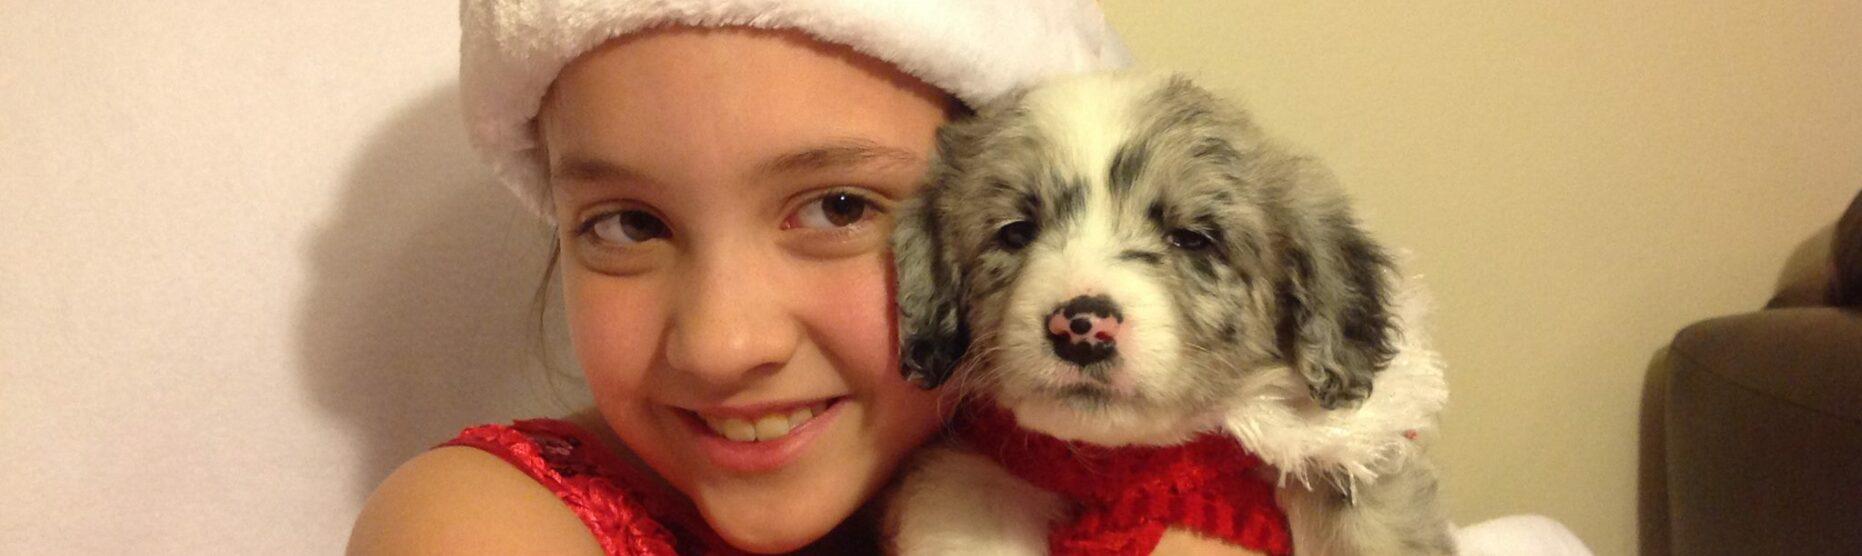 Southern Oregon Aussie Doodle Hypoallergenic Puppies - Australian Shepherd Poodle Puppies